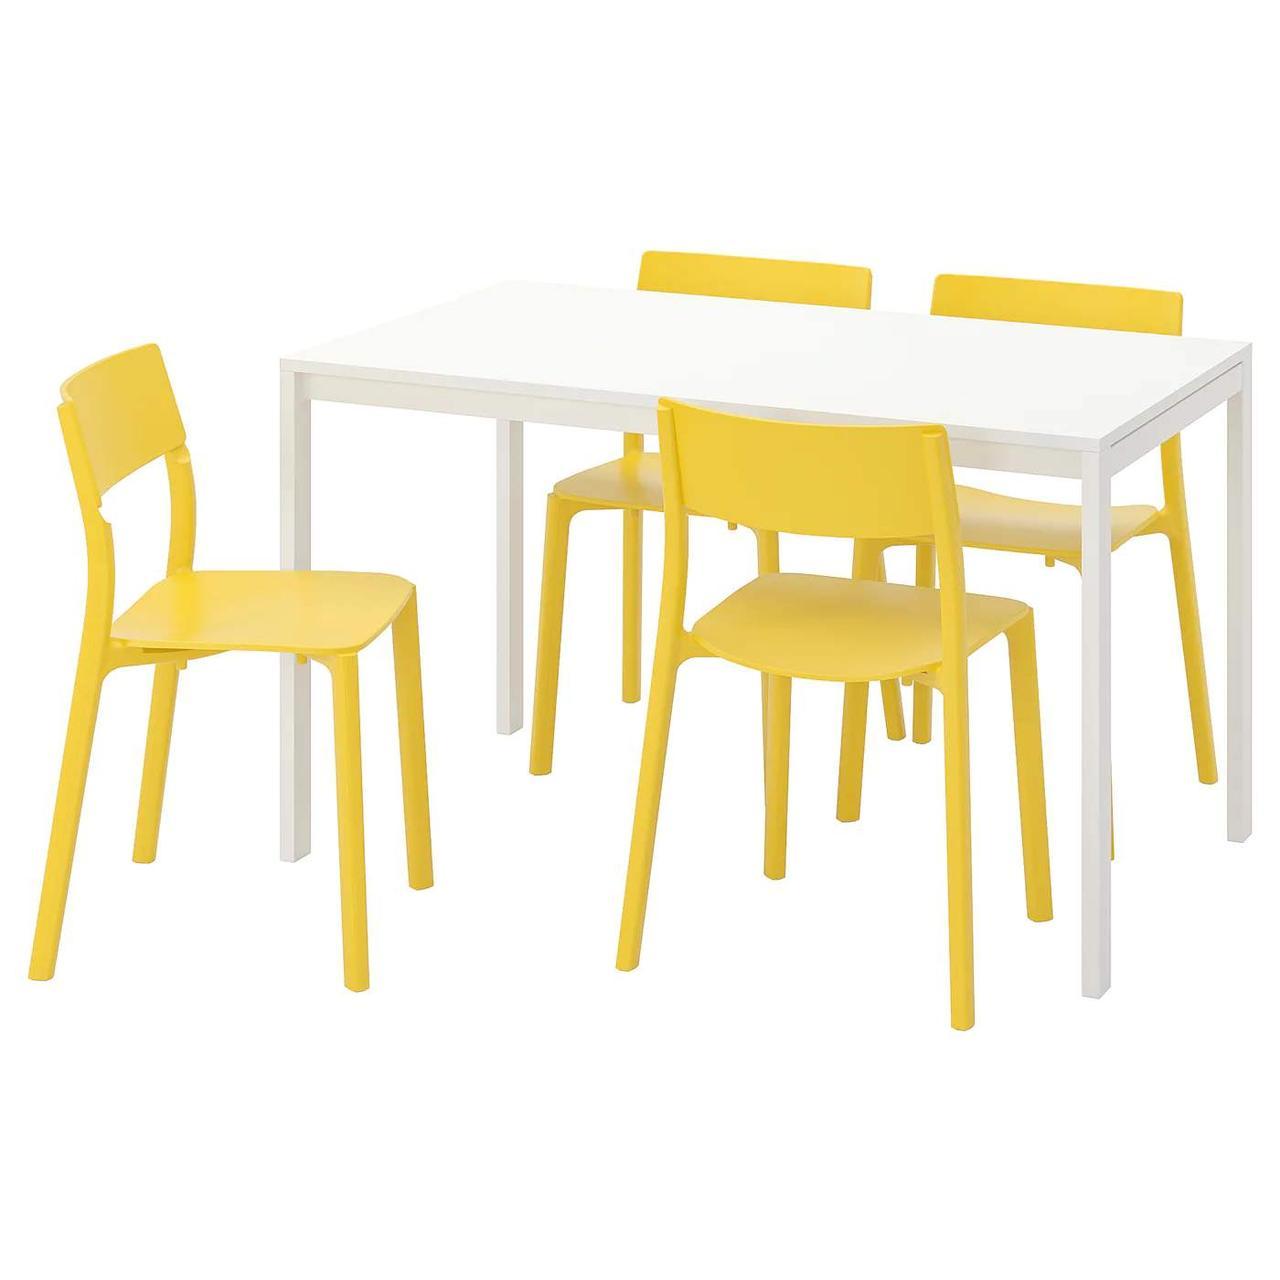 Стол и 4 стула MELLTORP / JANINGE